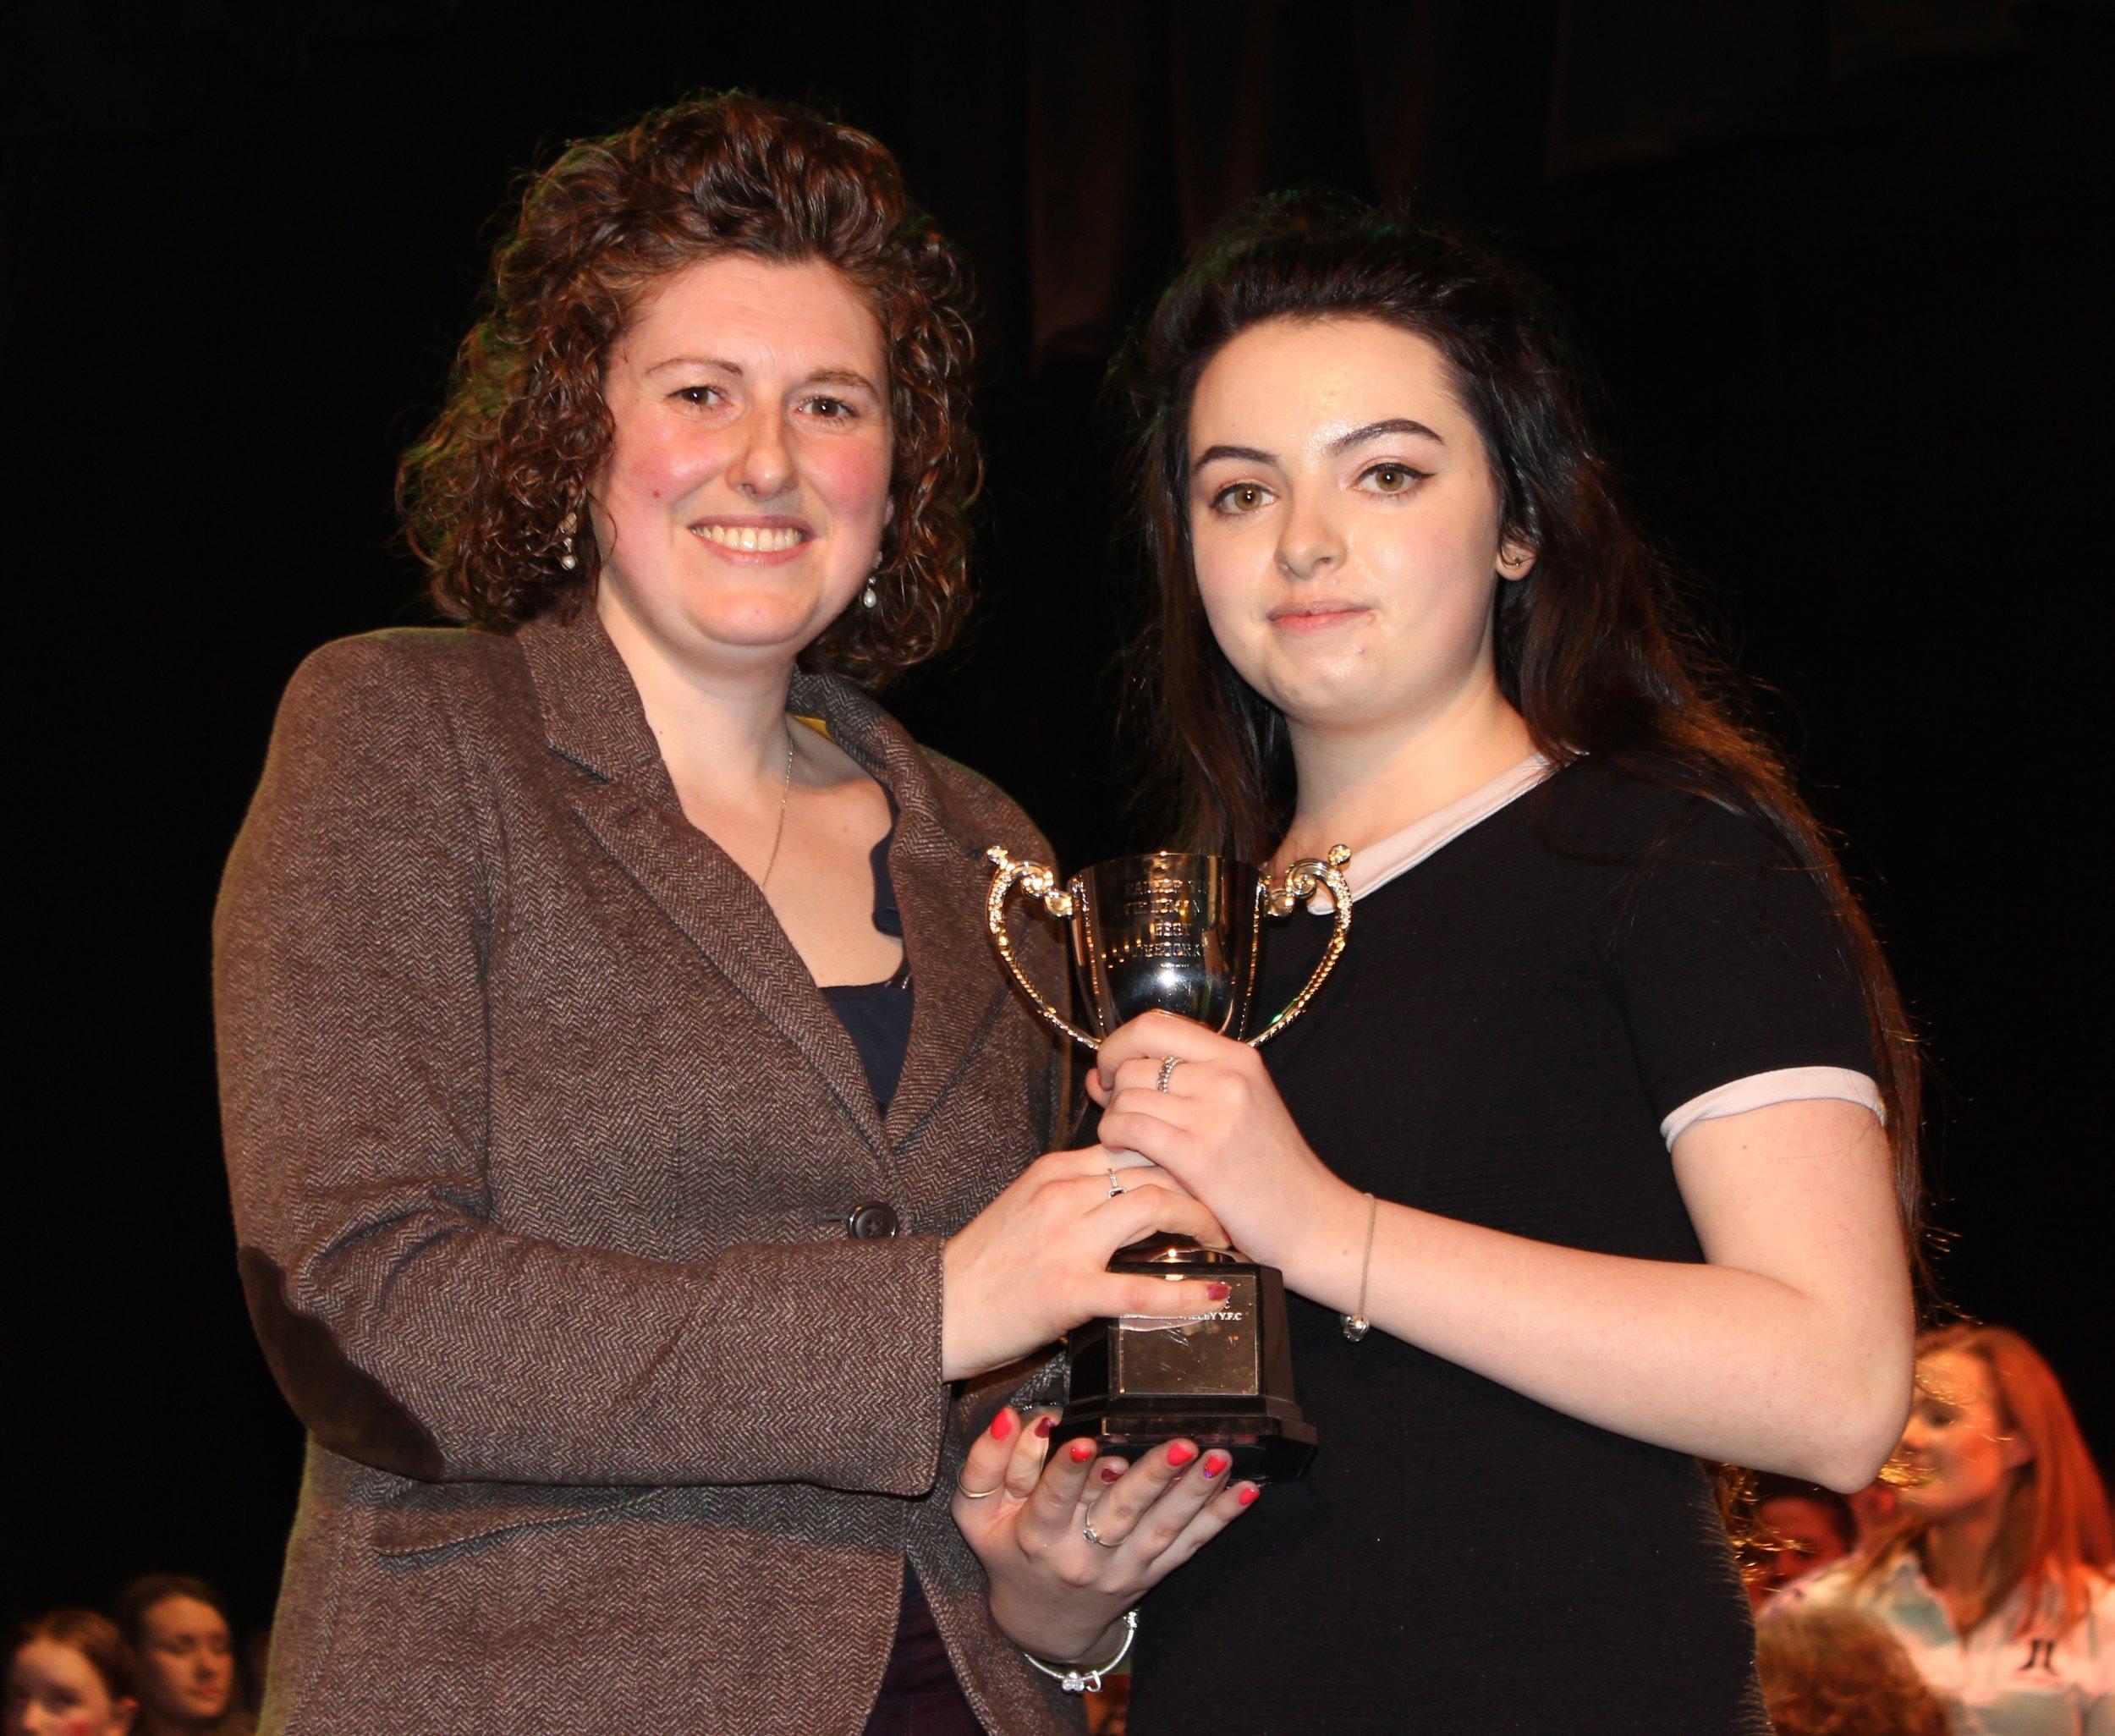 Jess Morgan, Knighton YFC - Evie Doman Cup for Best Choreography.